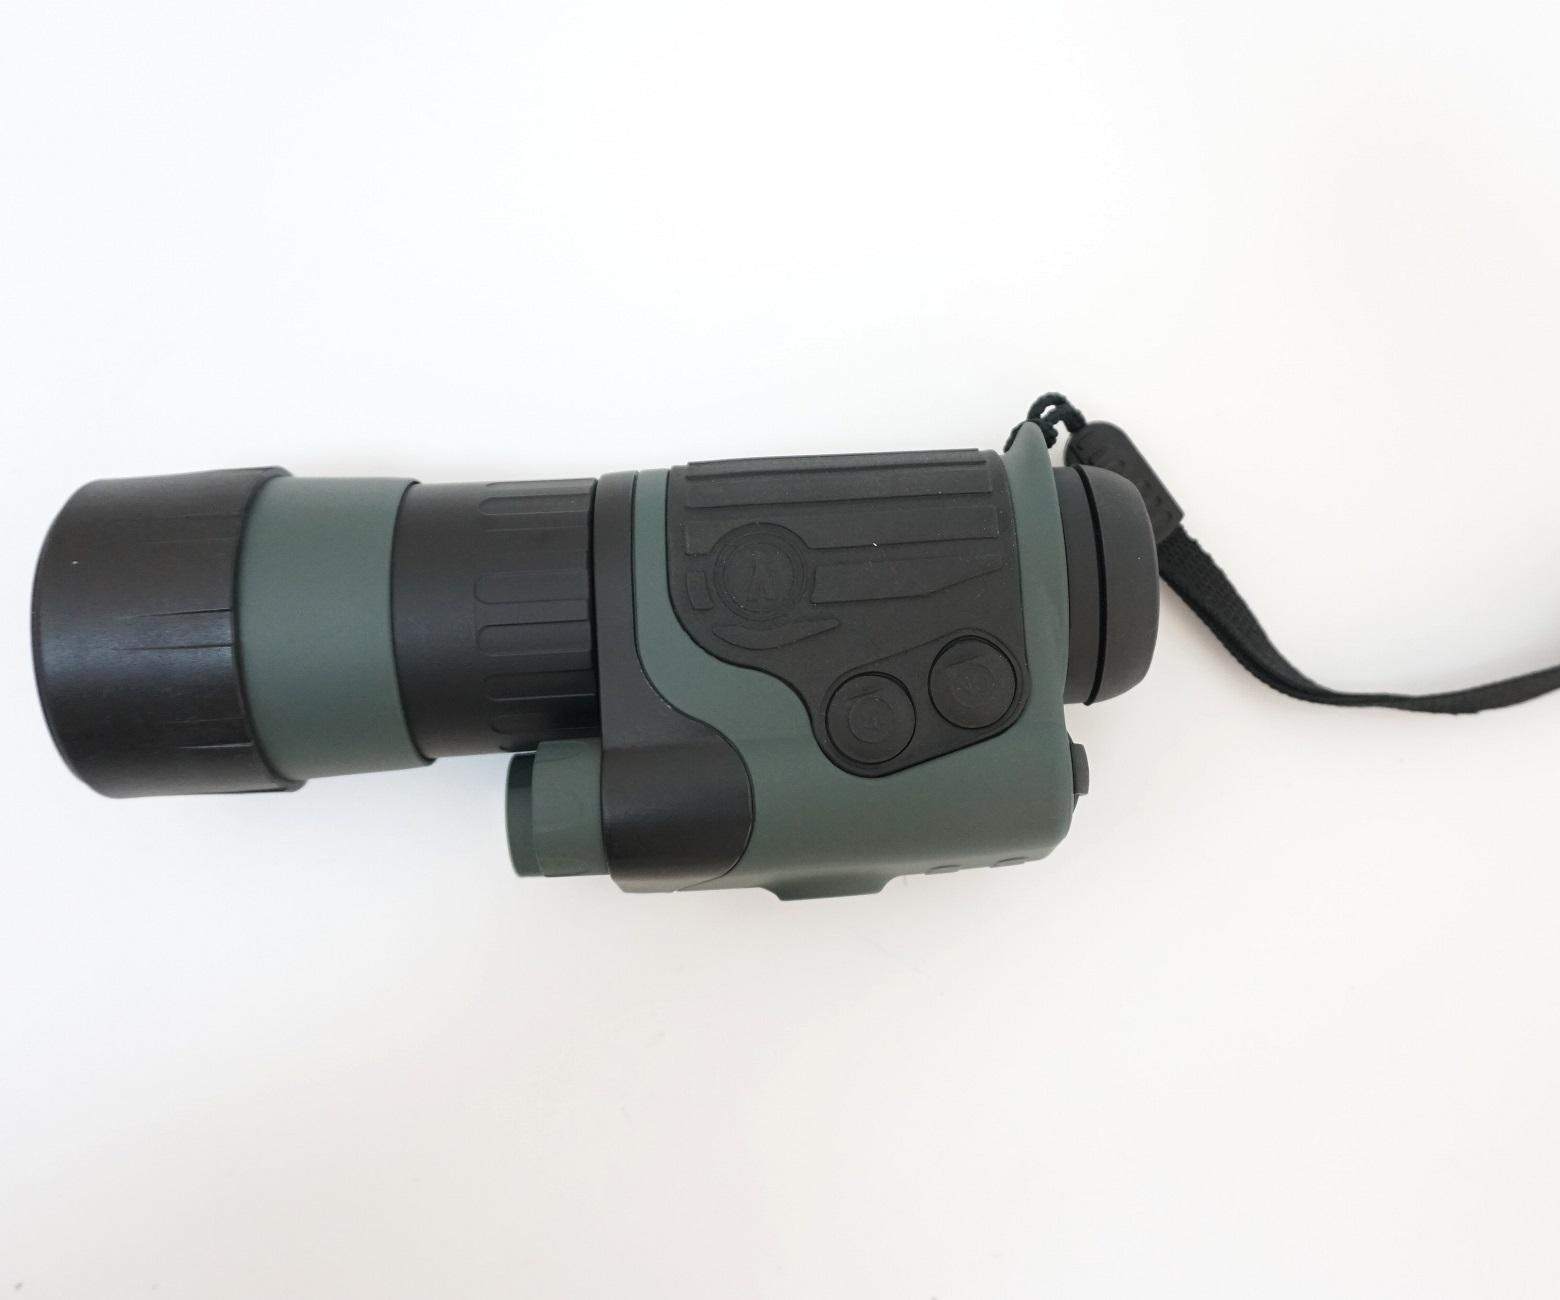 Yukon NV МТ Spartan 4x50